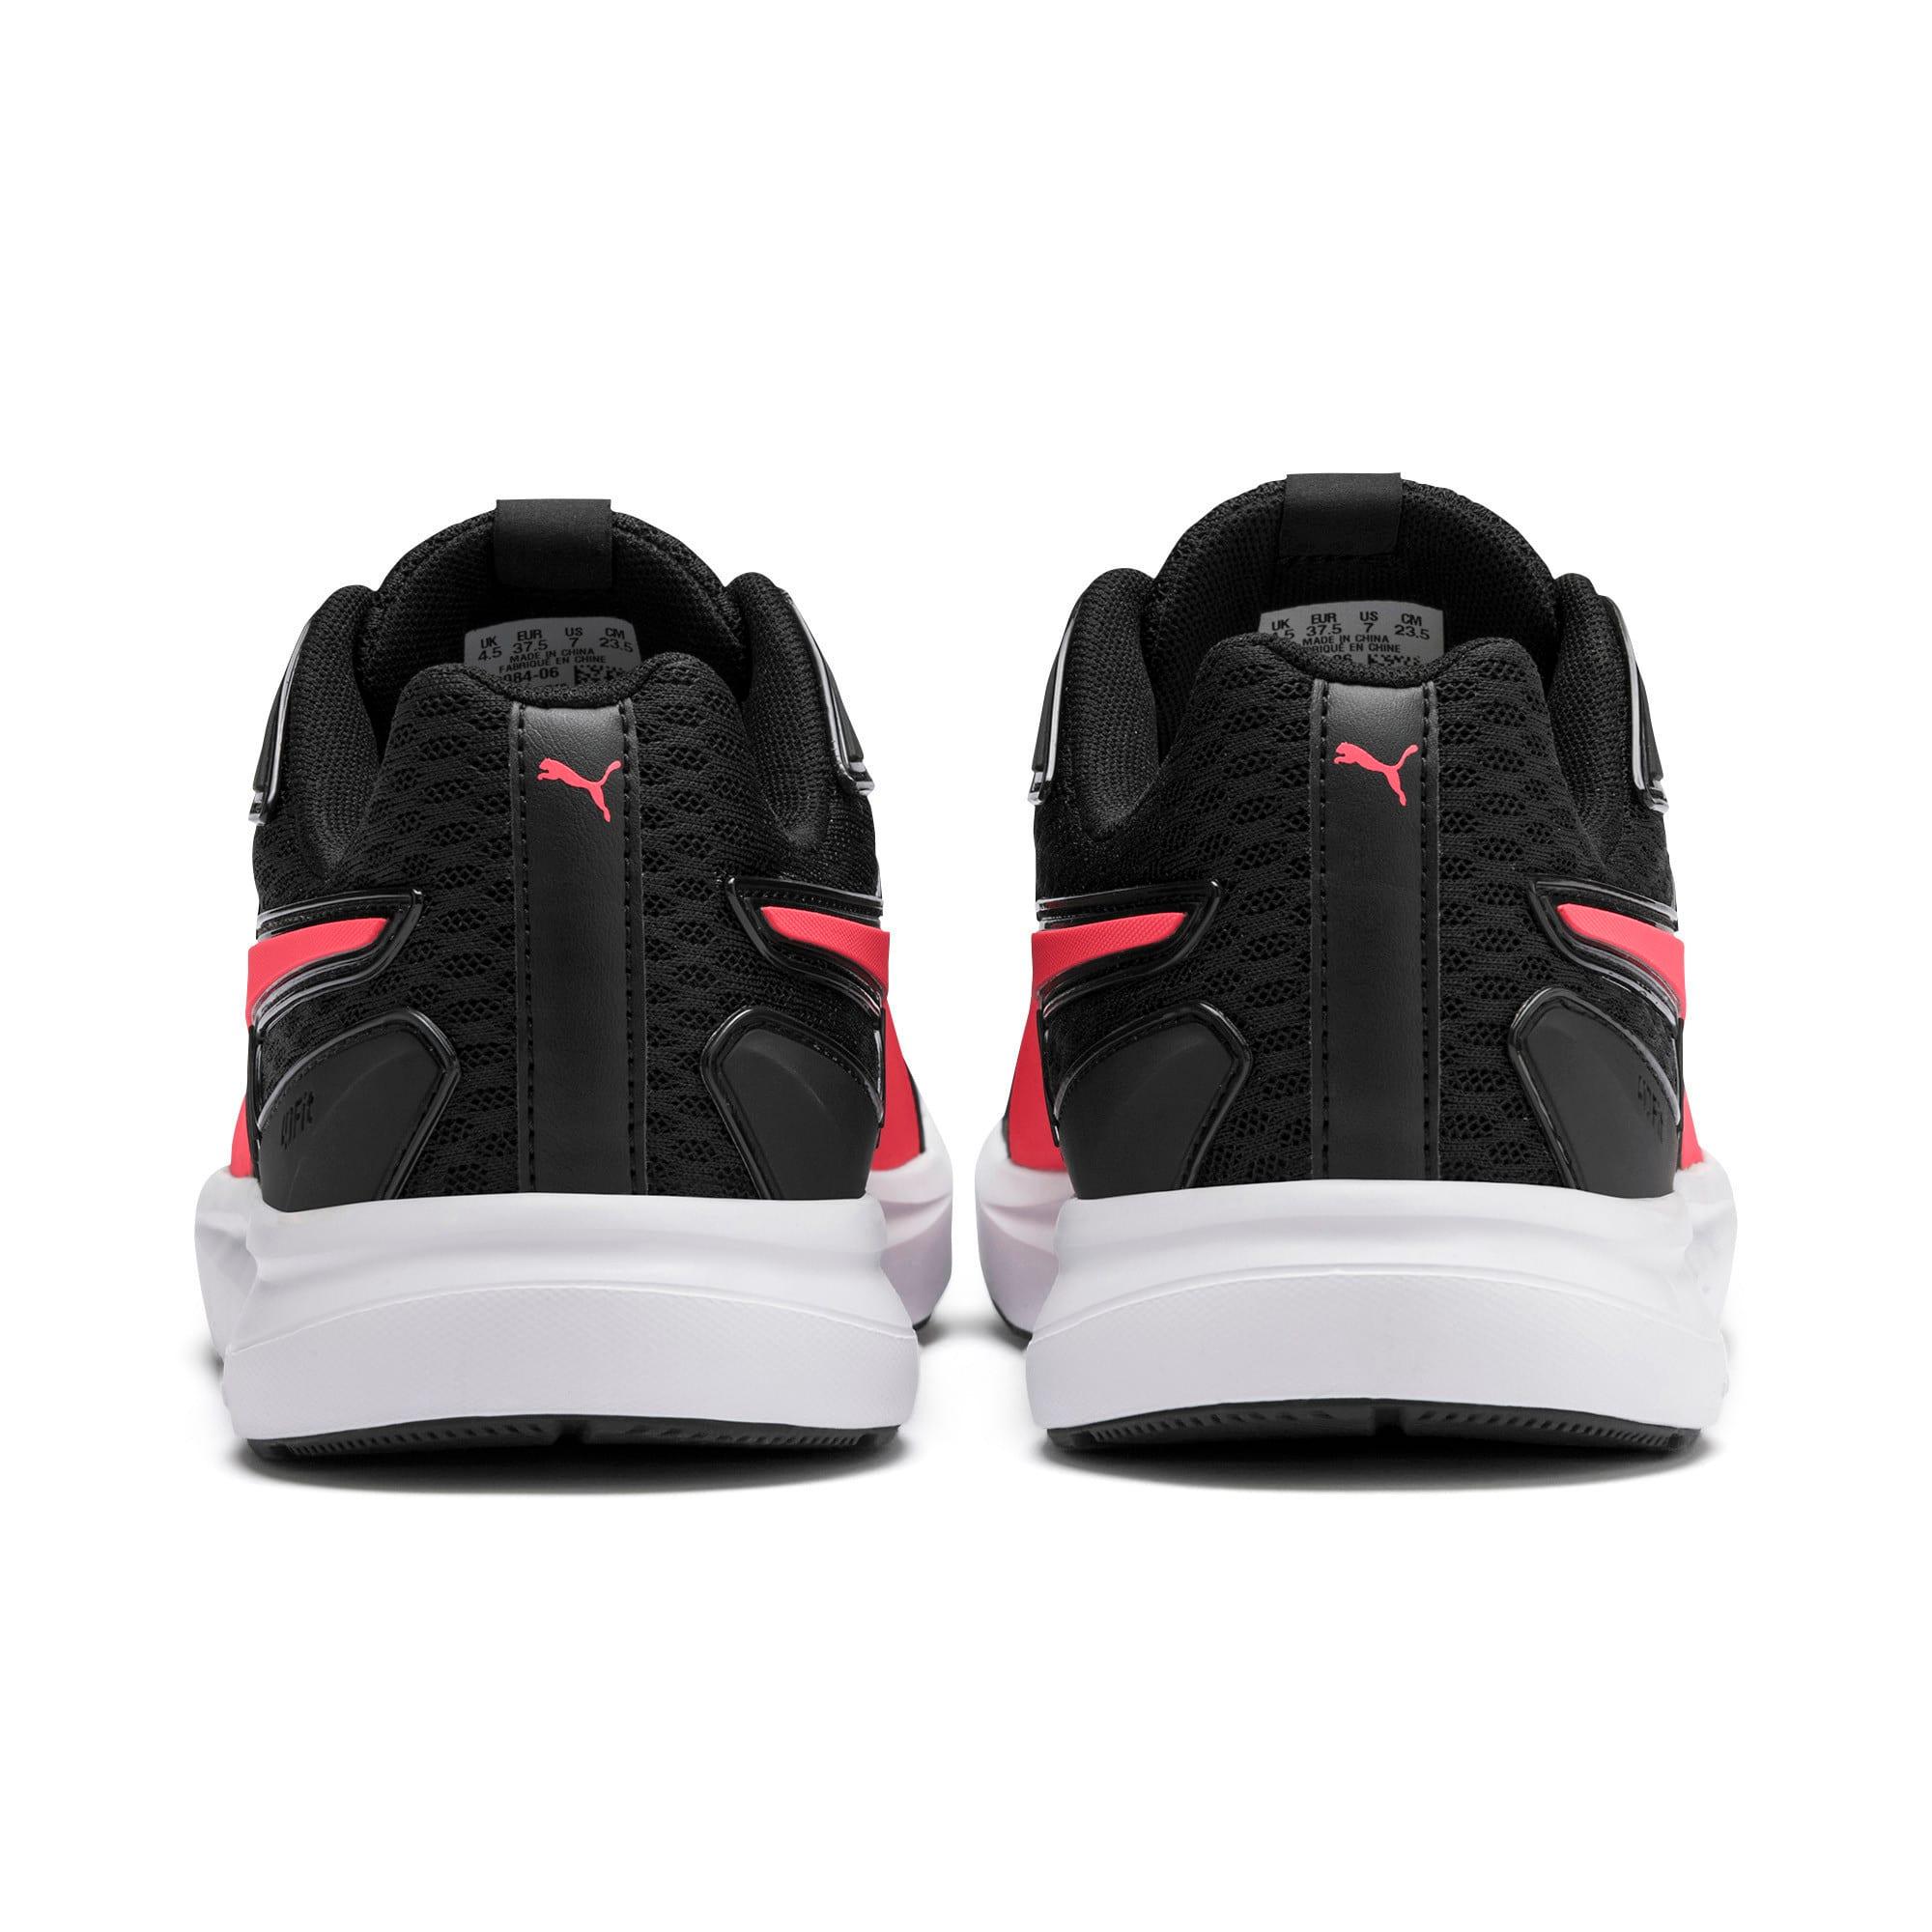 Thumbnail 6 of Escaper Pro Training Shoes, Black-Calypso Coral-White, medium-IND